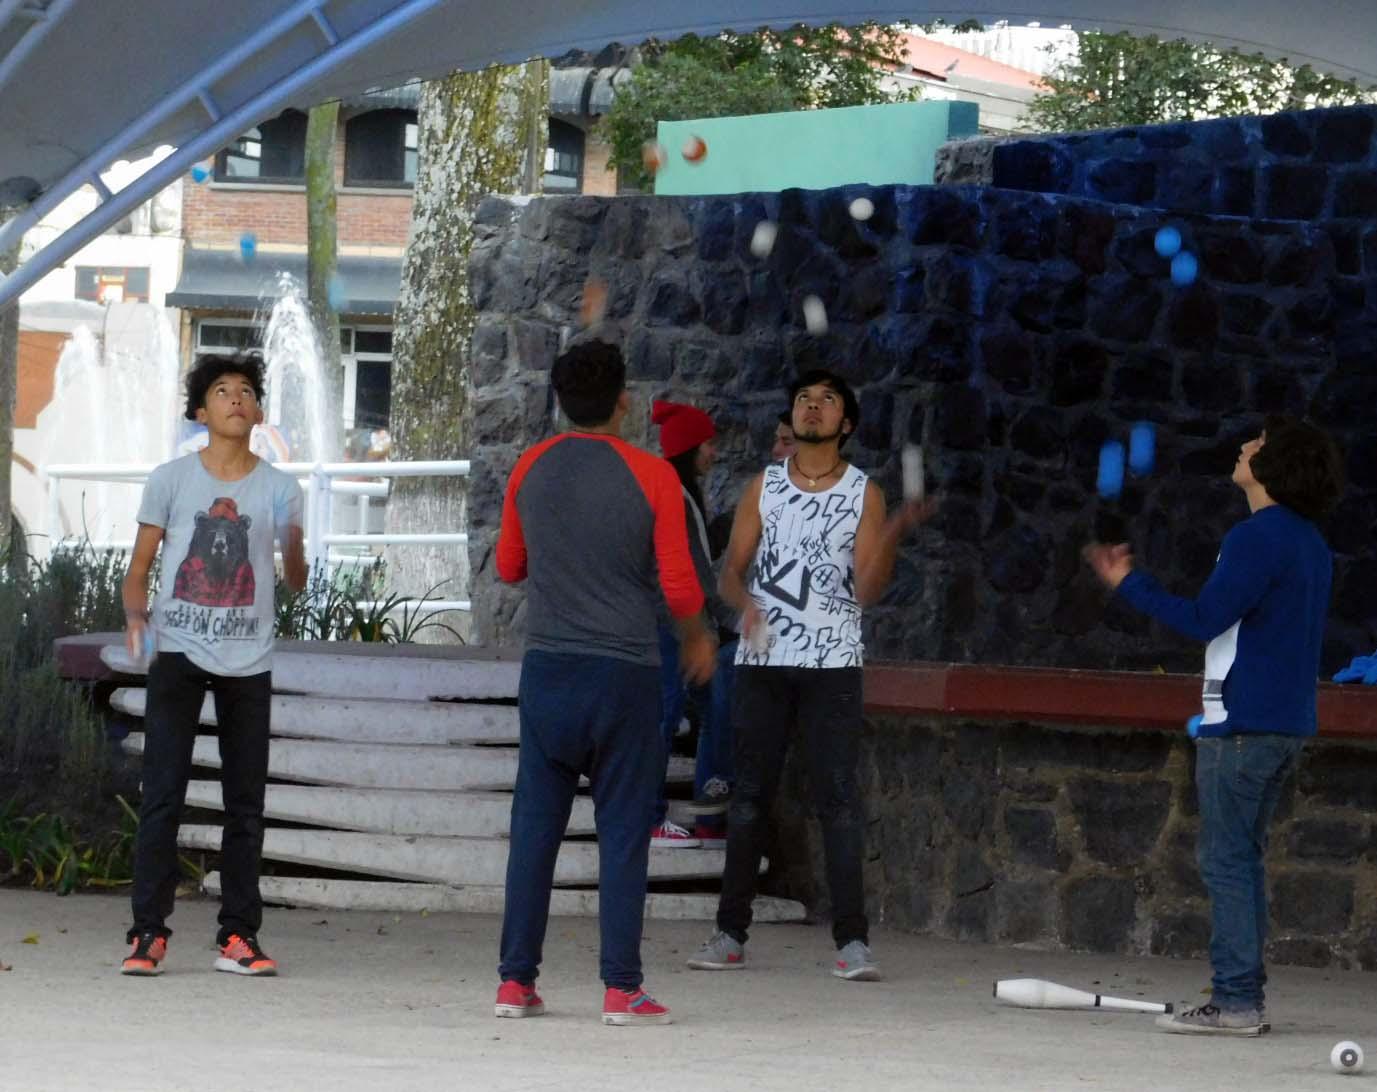 Encuentro internacional de malabares en toluca agencia manl for Viveros en toluca